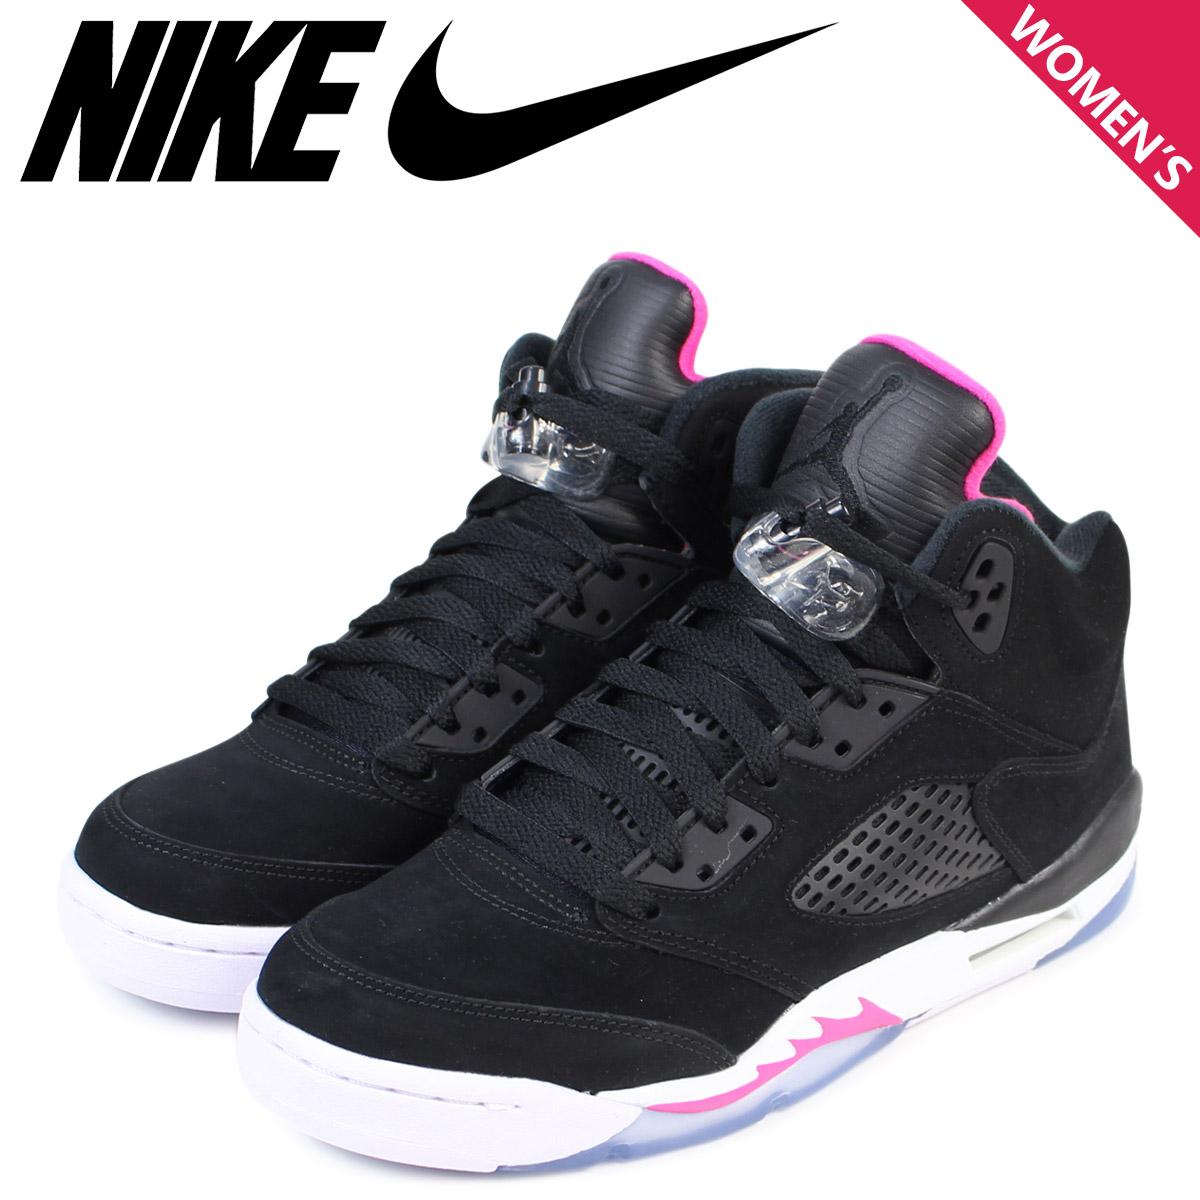 2ae39a05db53c1 NIKE Nike Air Jordan 5 nostalgic lady s sneakers AIR JORDAN 5 RETRO GG  440